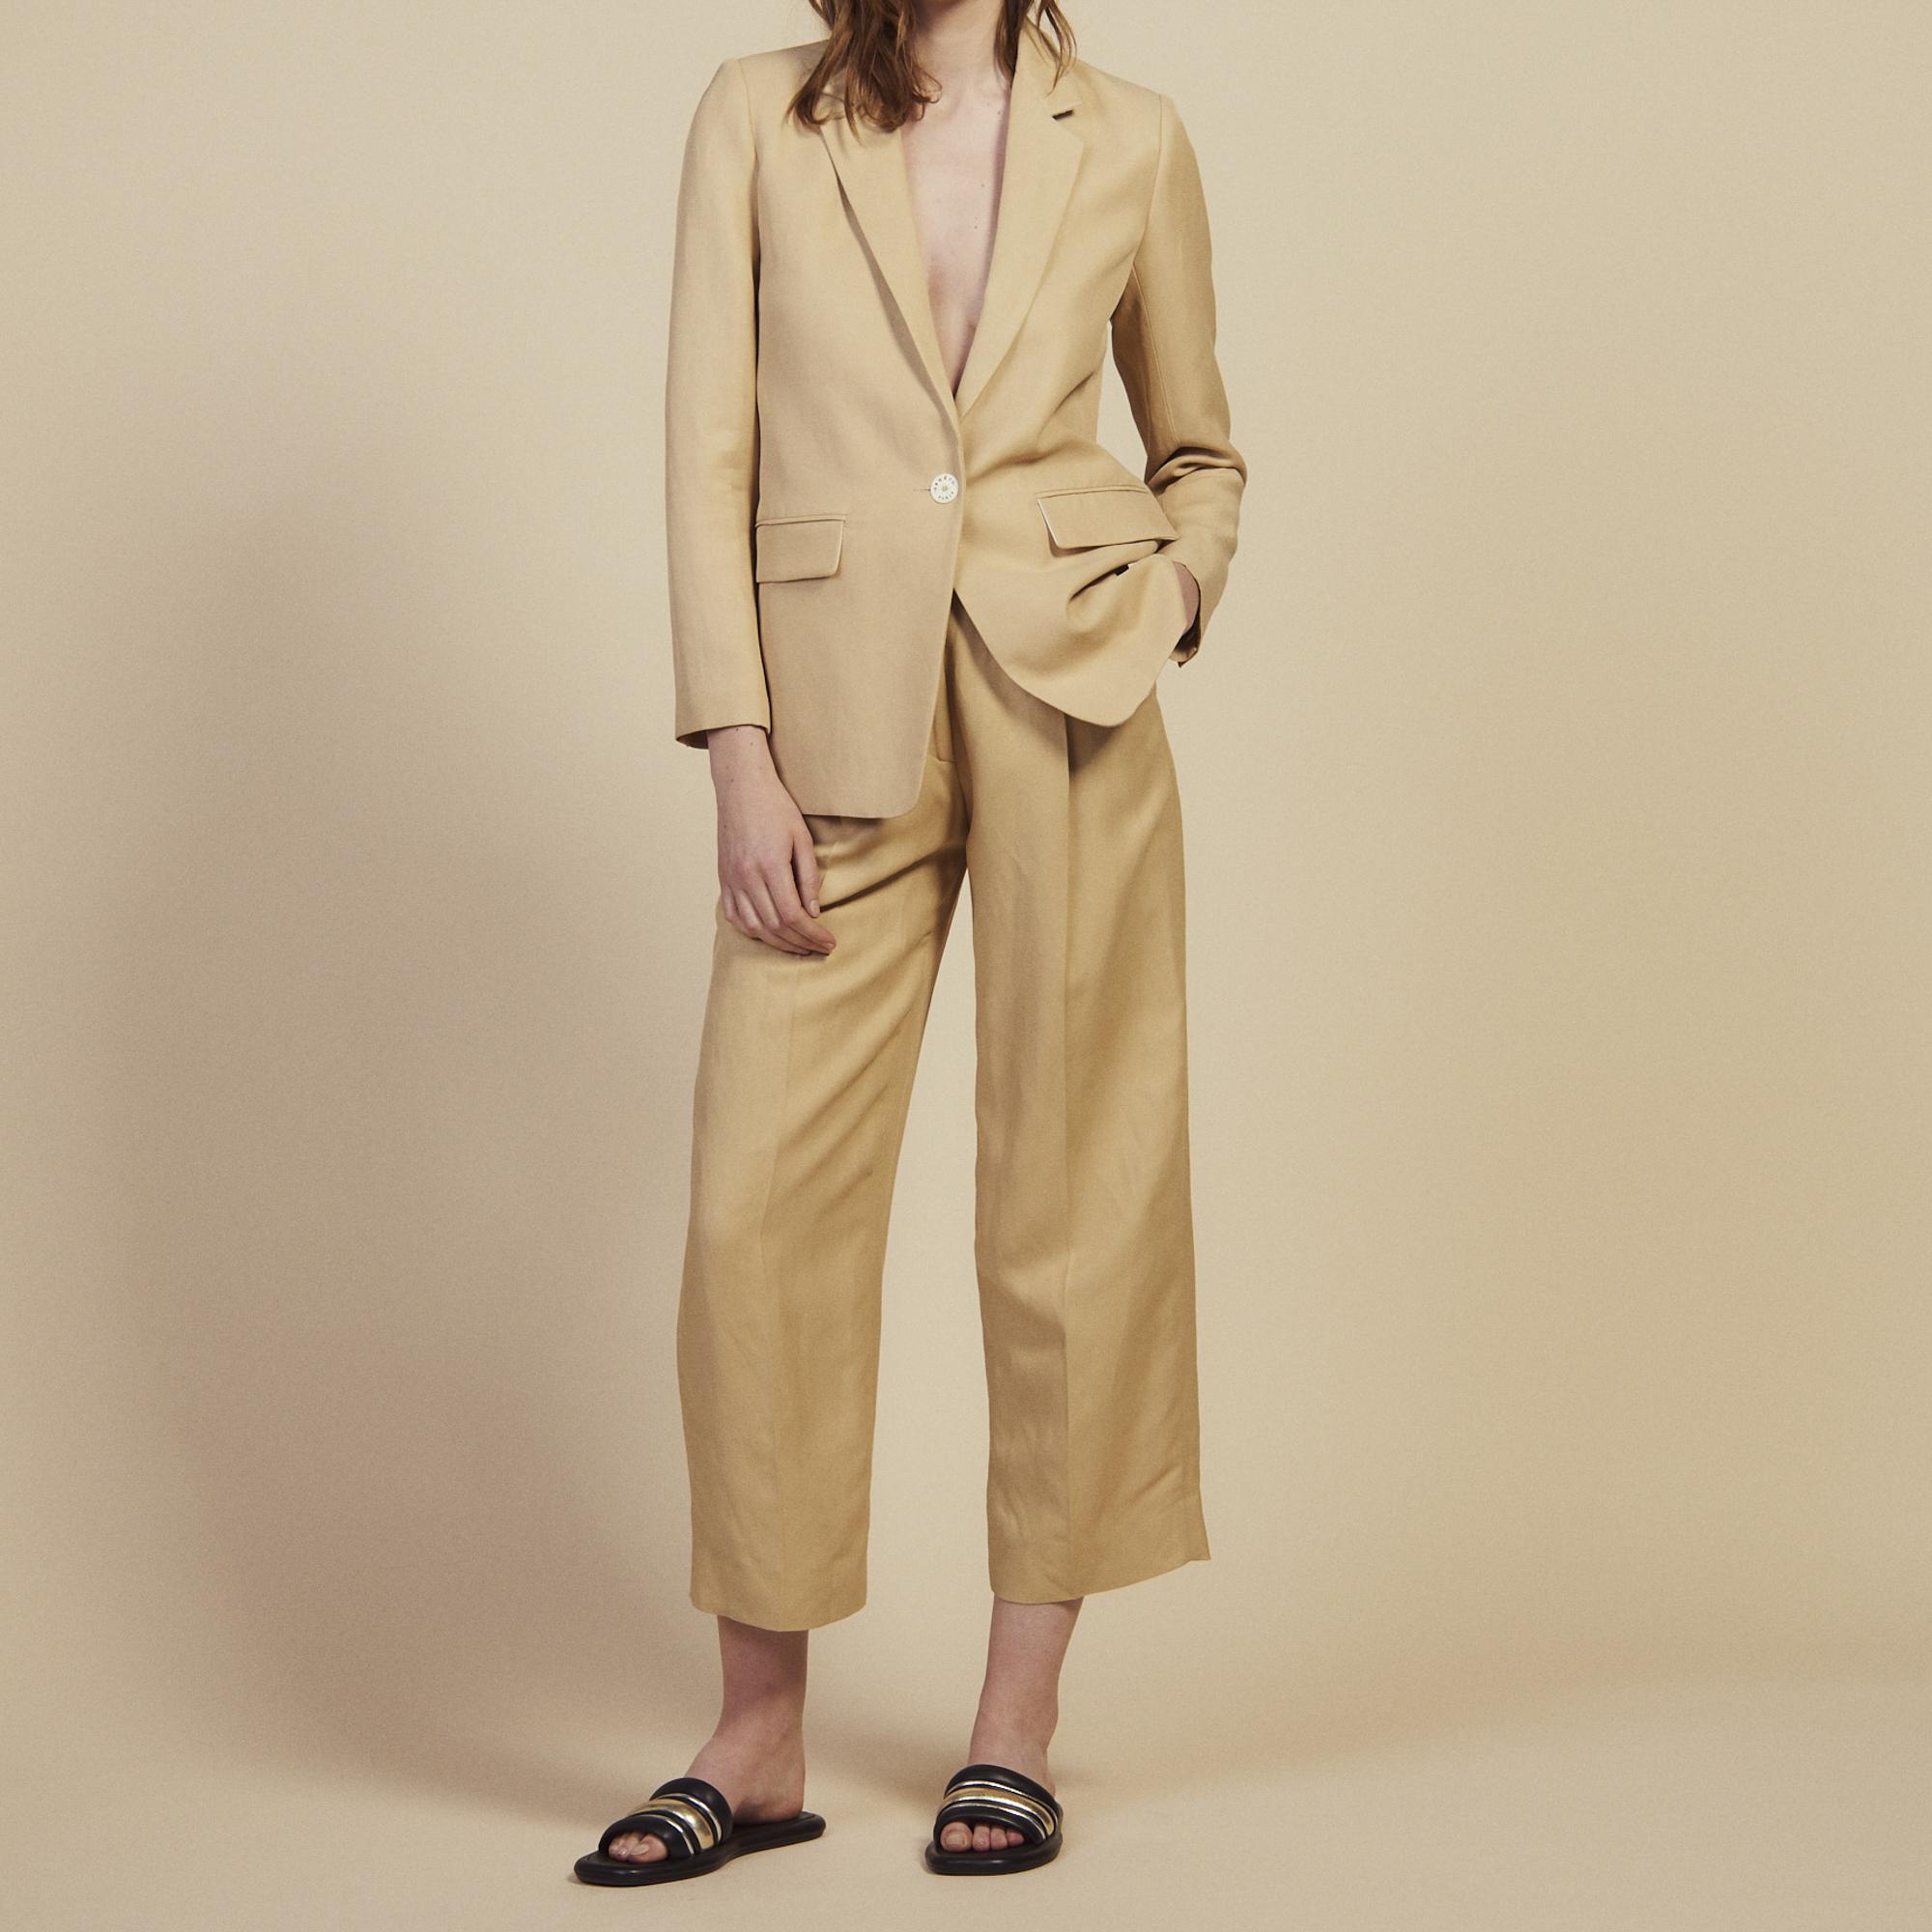 Veste tailleur femme sandro